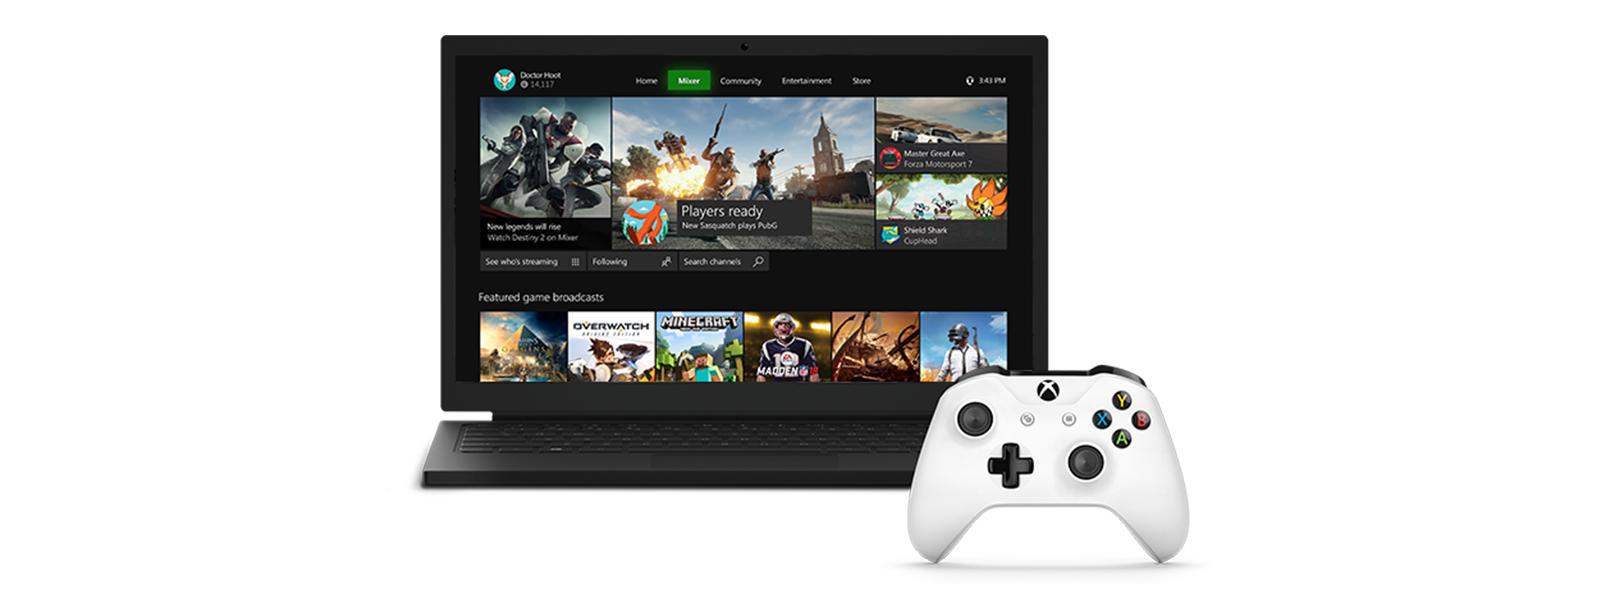 Ny Mixer-grænseflade til Windows 10-gaming